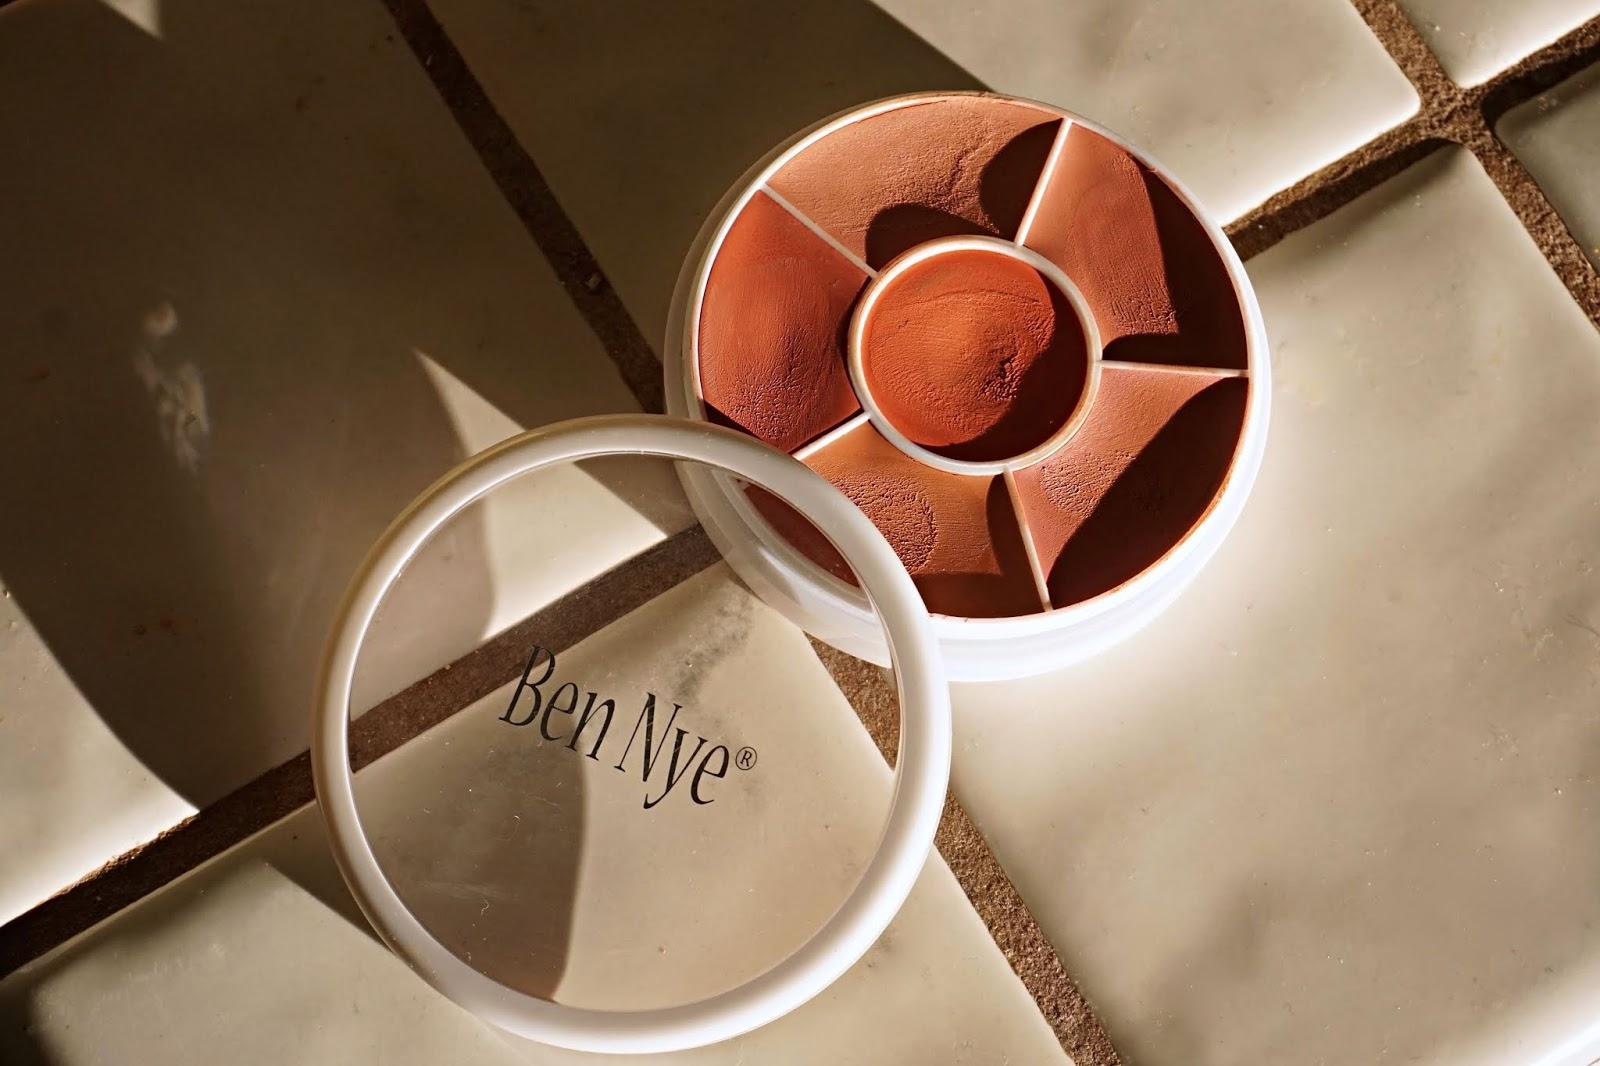 Ben Nye Creme Rouge Wheel in Natural Glow swatches